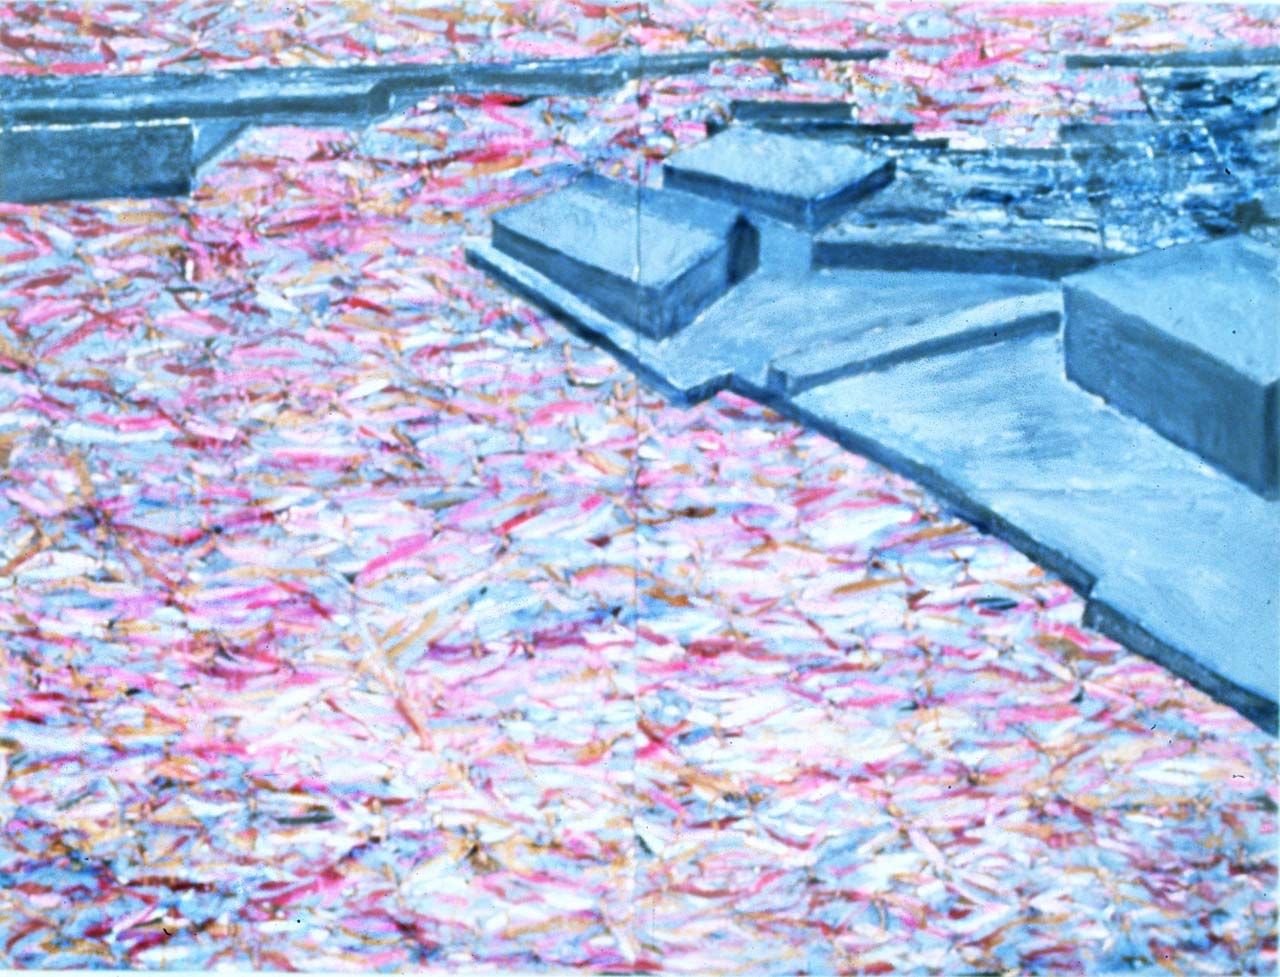 Gowanus Bay